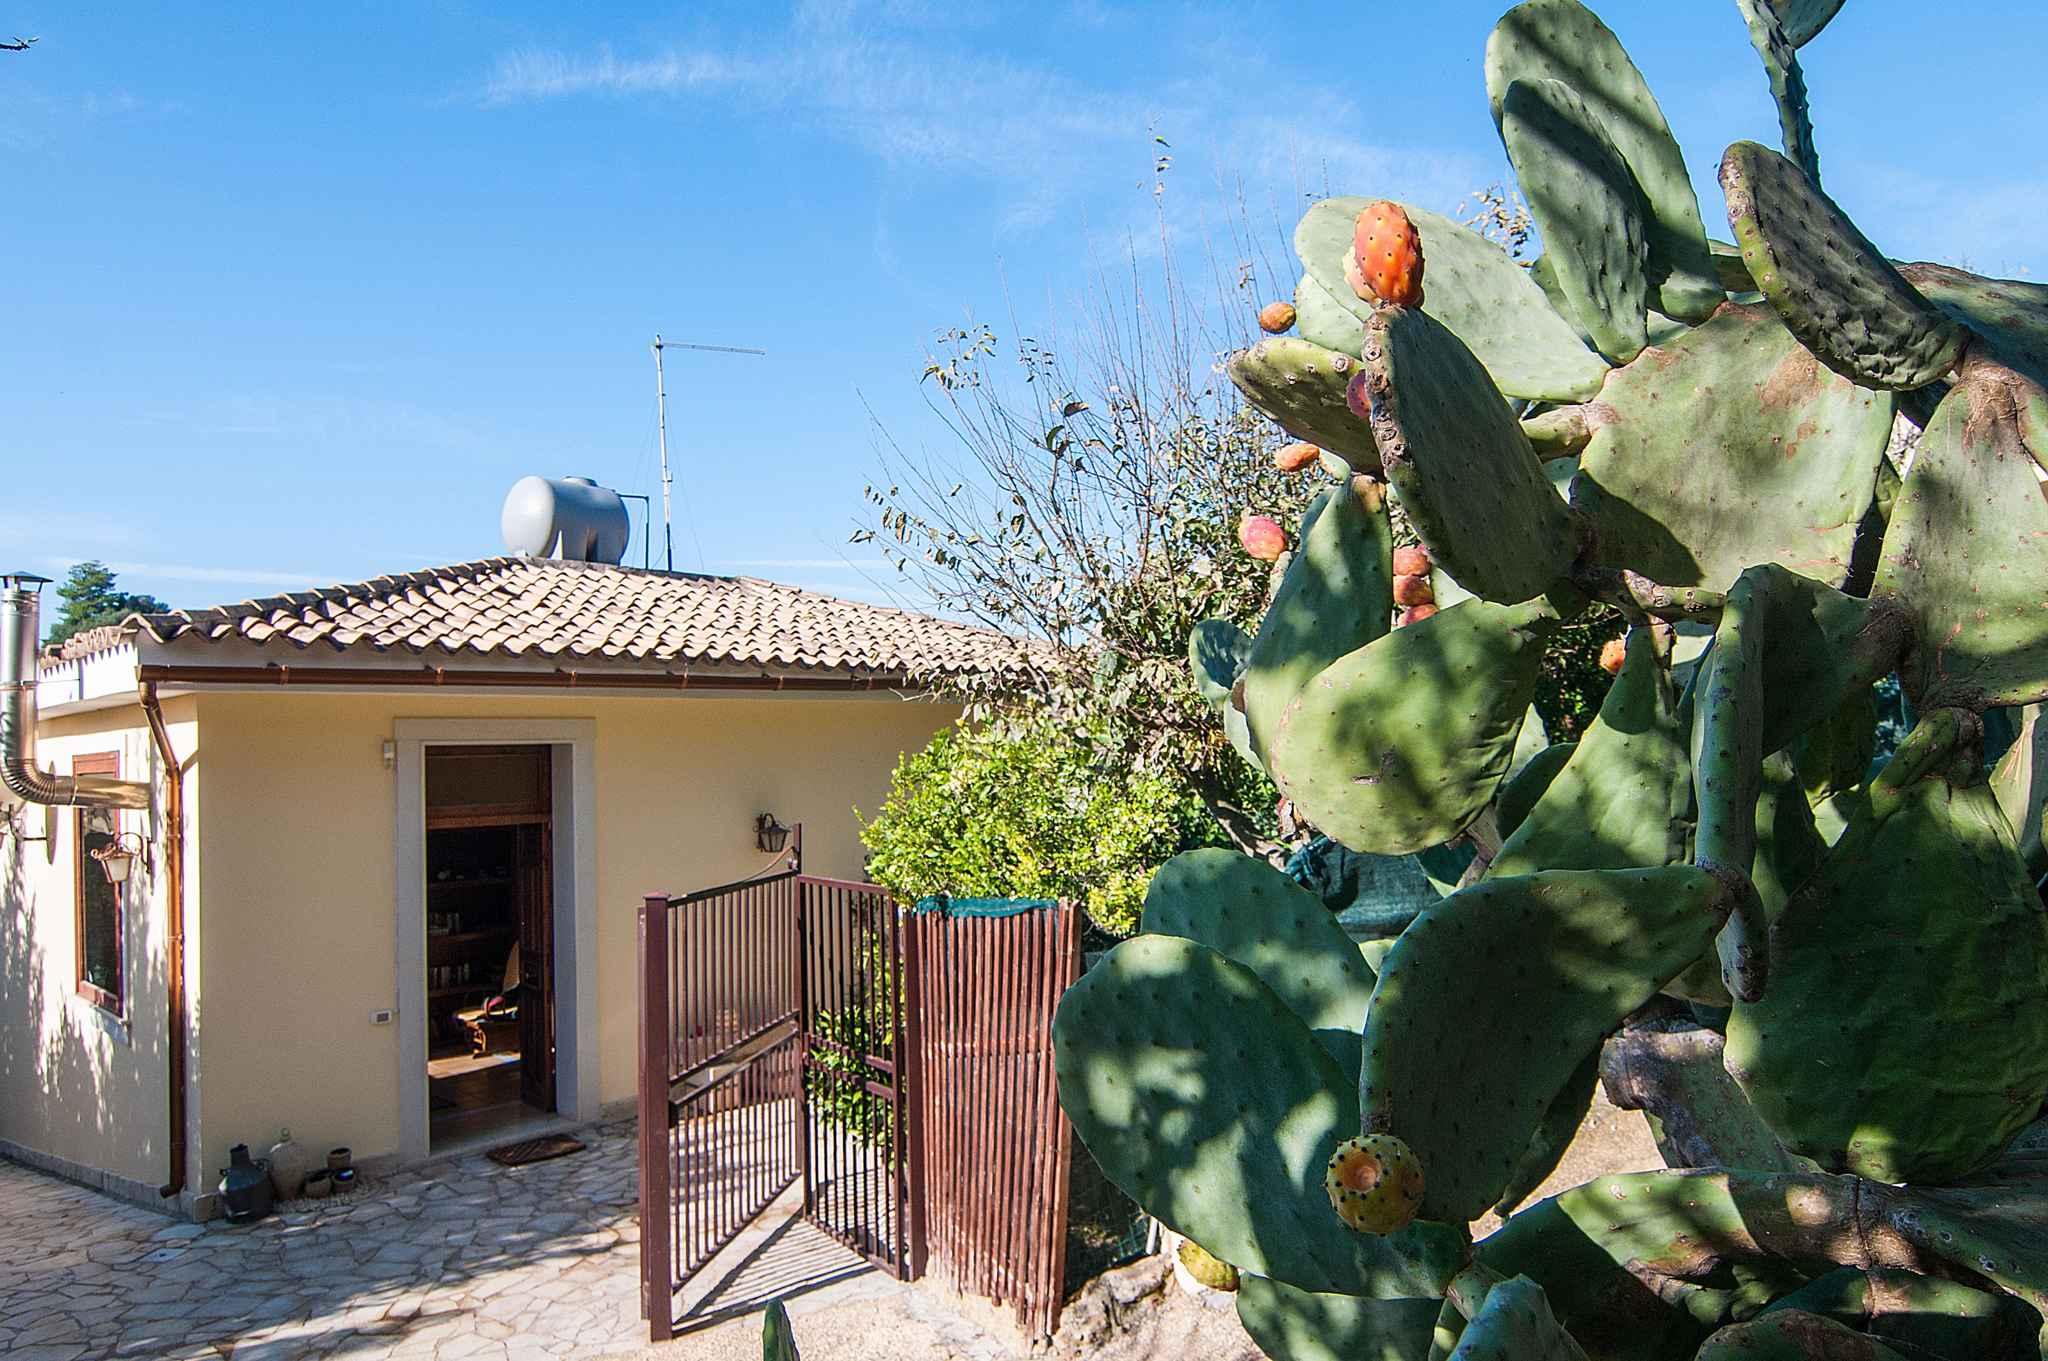 Maison de vacances mit Blick auf Zitronengarten (317534), Lido di Noto, Siracusa, Sicile, Italie, image 9